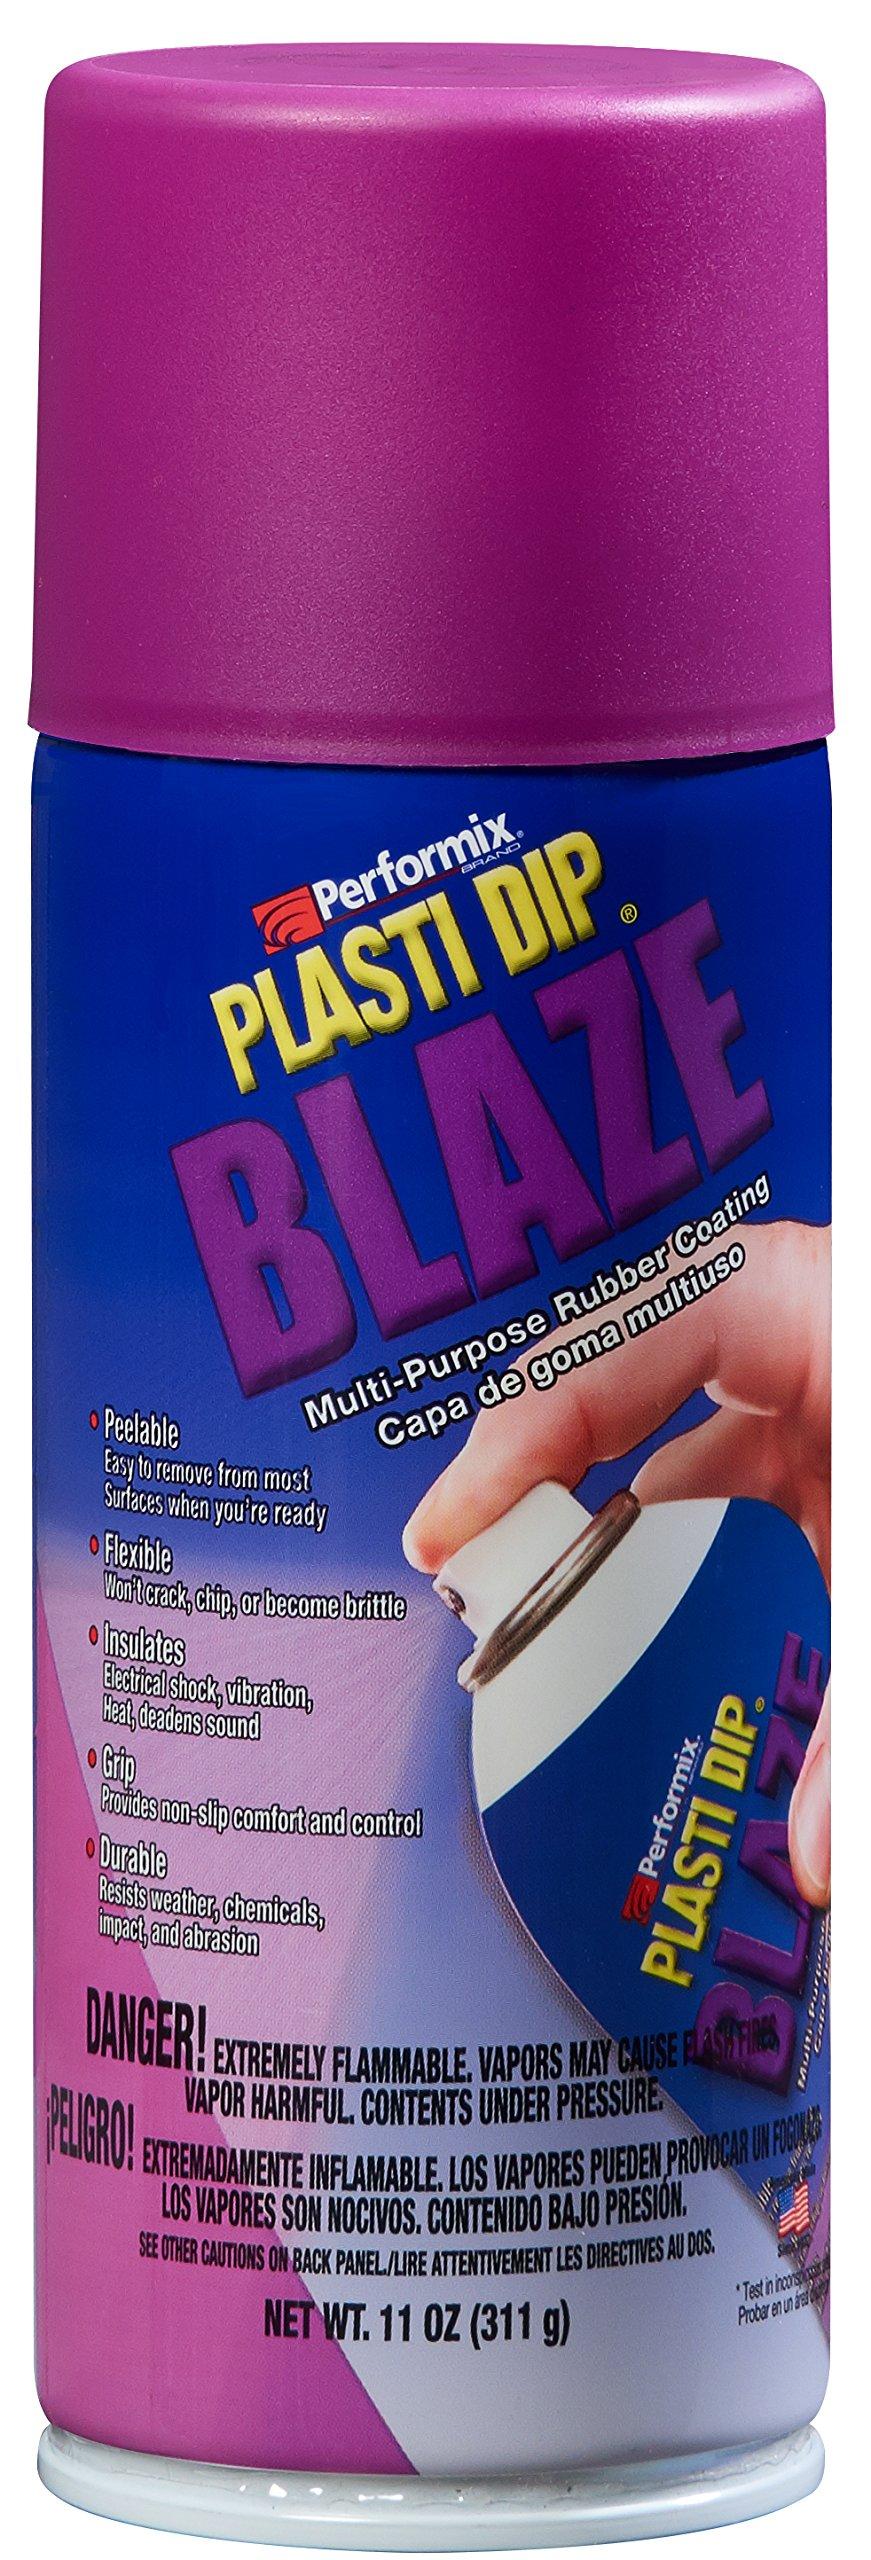 Plasti Dip 11225-6-6PK Spray Blaze Purple, 11. Fluid_Ounces